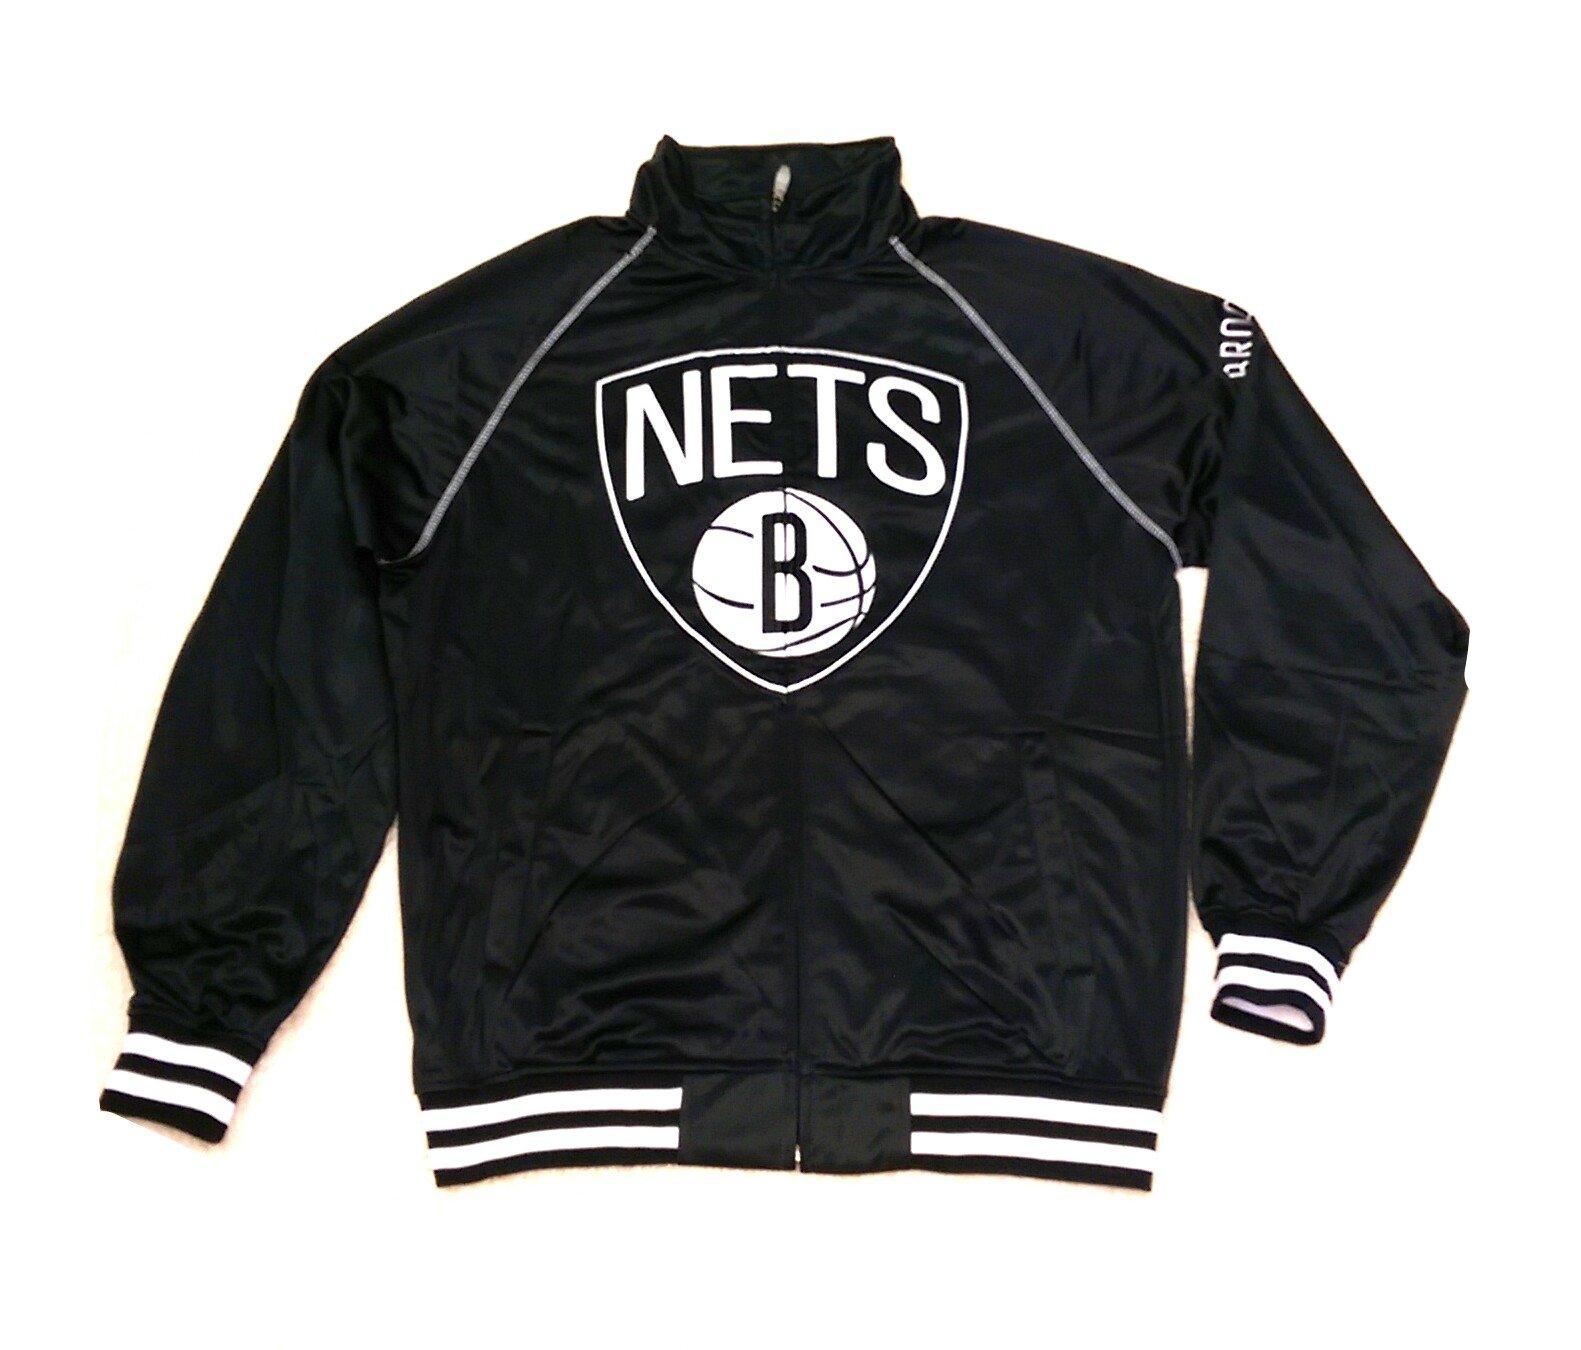 Majestic Mens NBA Brooklyn Nets Warm-Up Jacket Black/White (Large)